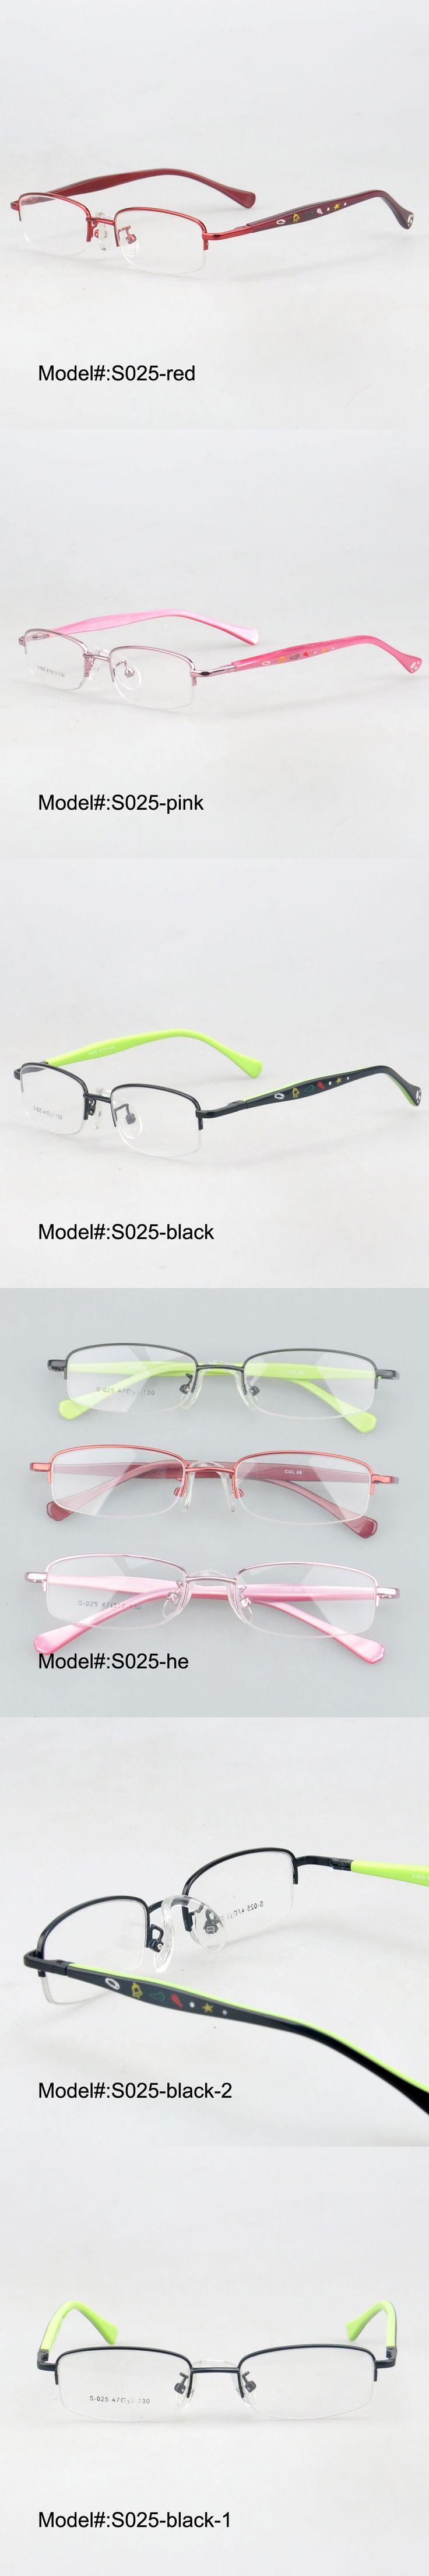 MY DOLI S025 Lovely colorful children metal frames acetate temple spring hinge prescription eyeglasses optical frame eyewear